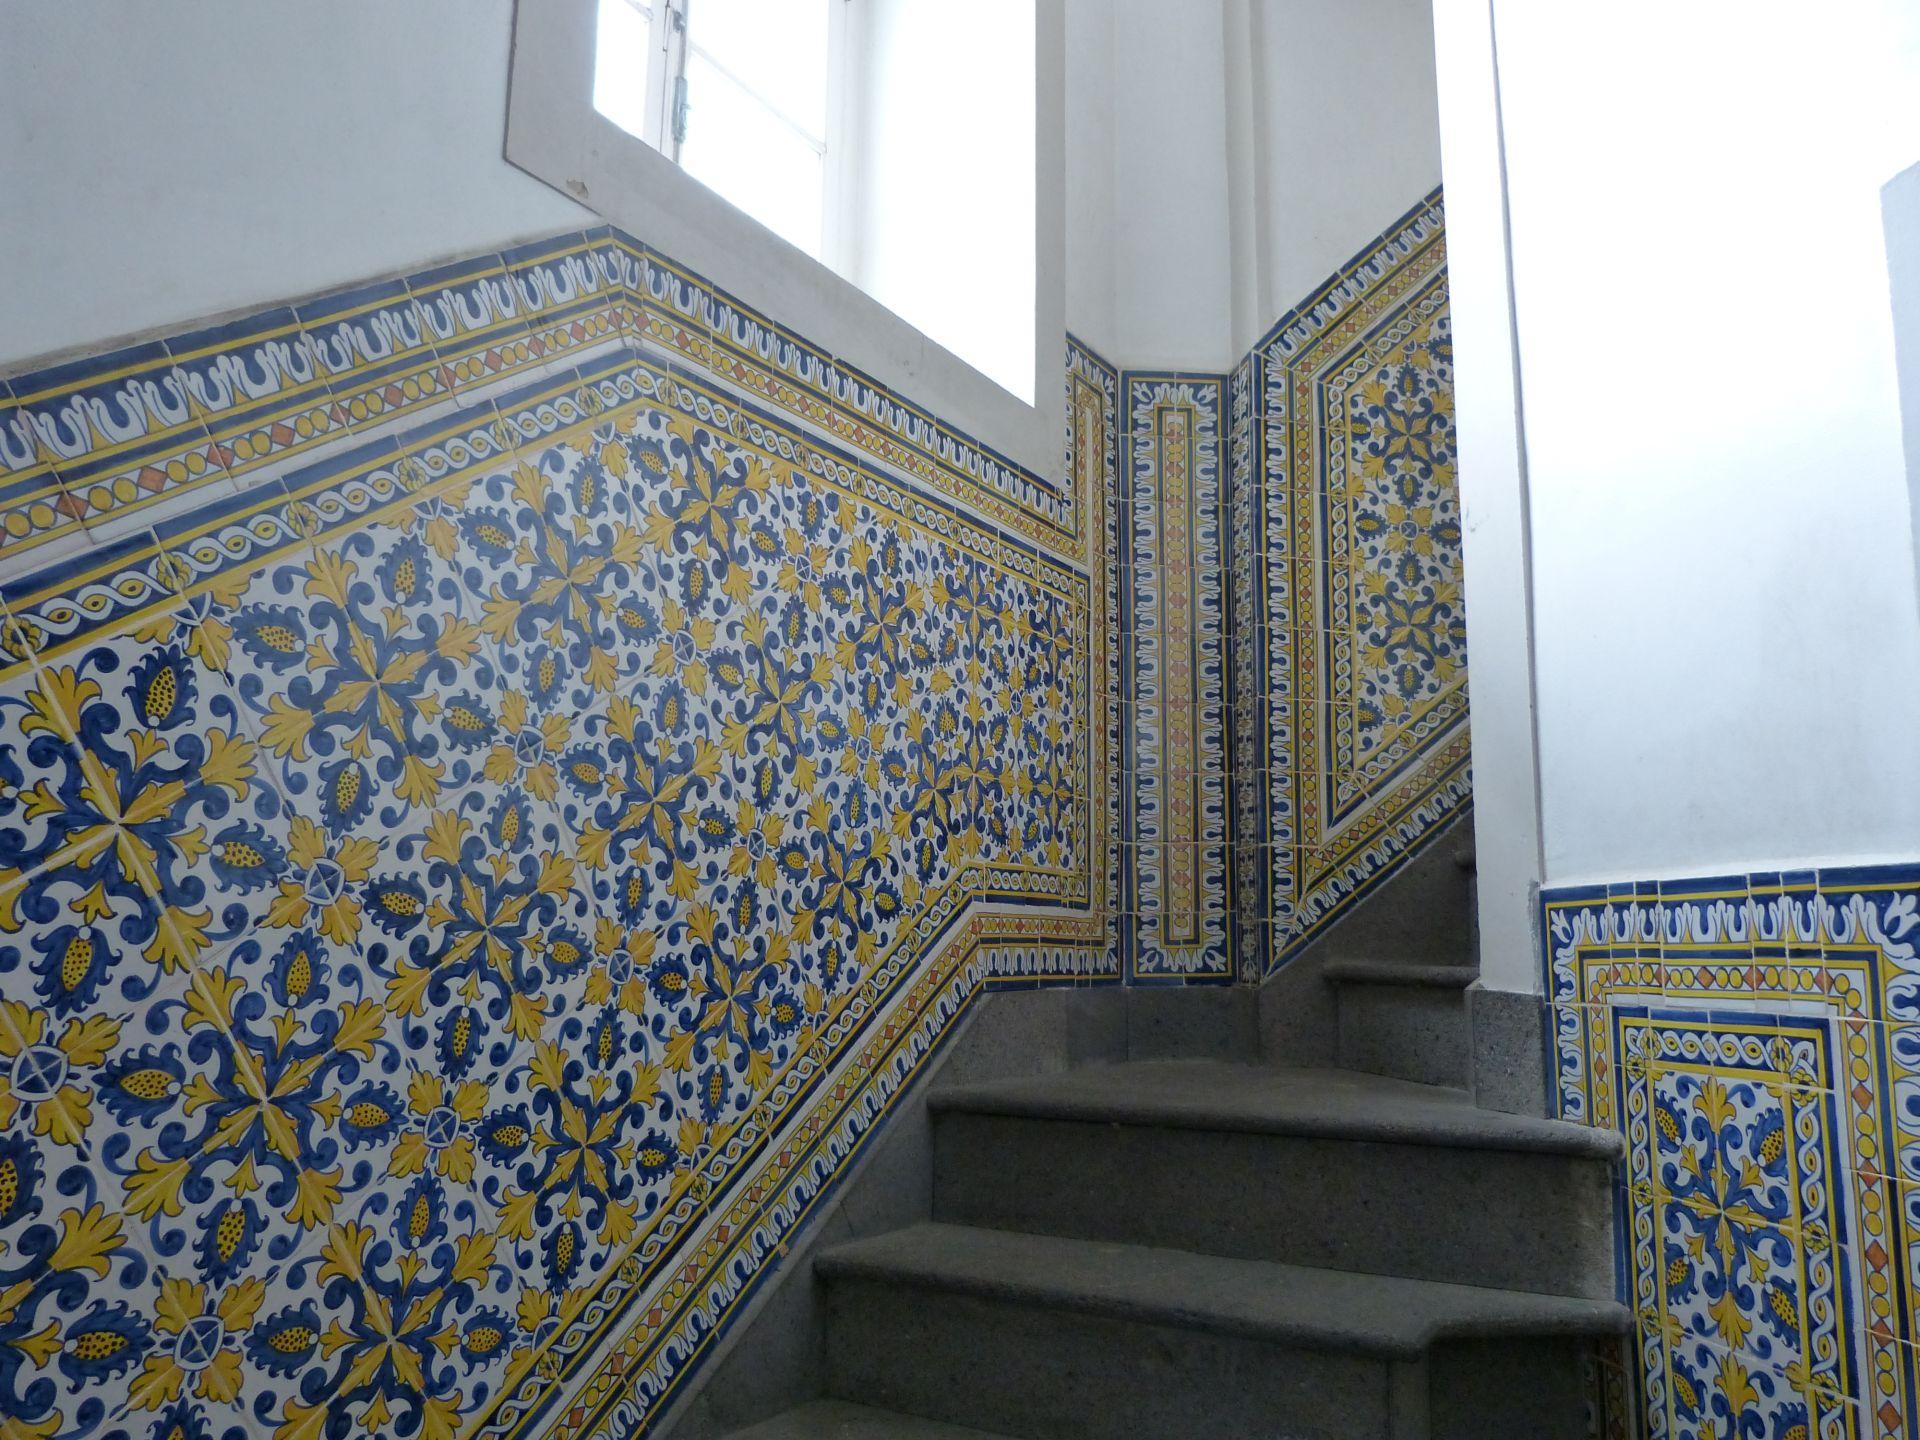 Azulejos in der Kirche Sao Sebastiao